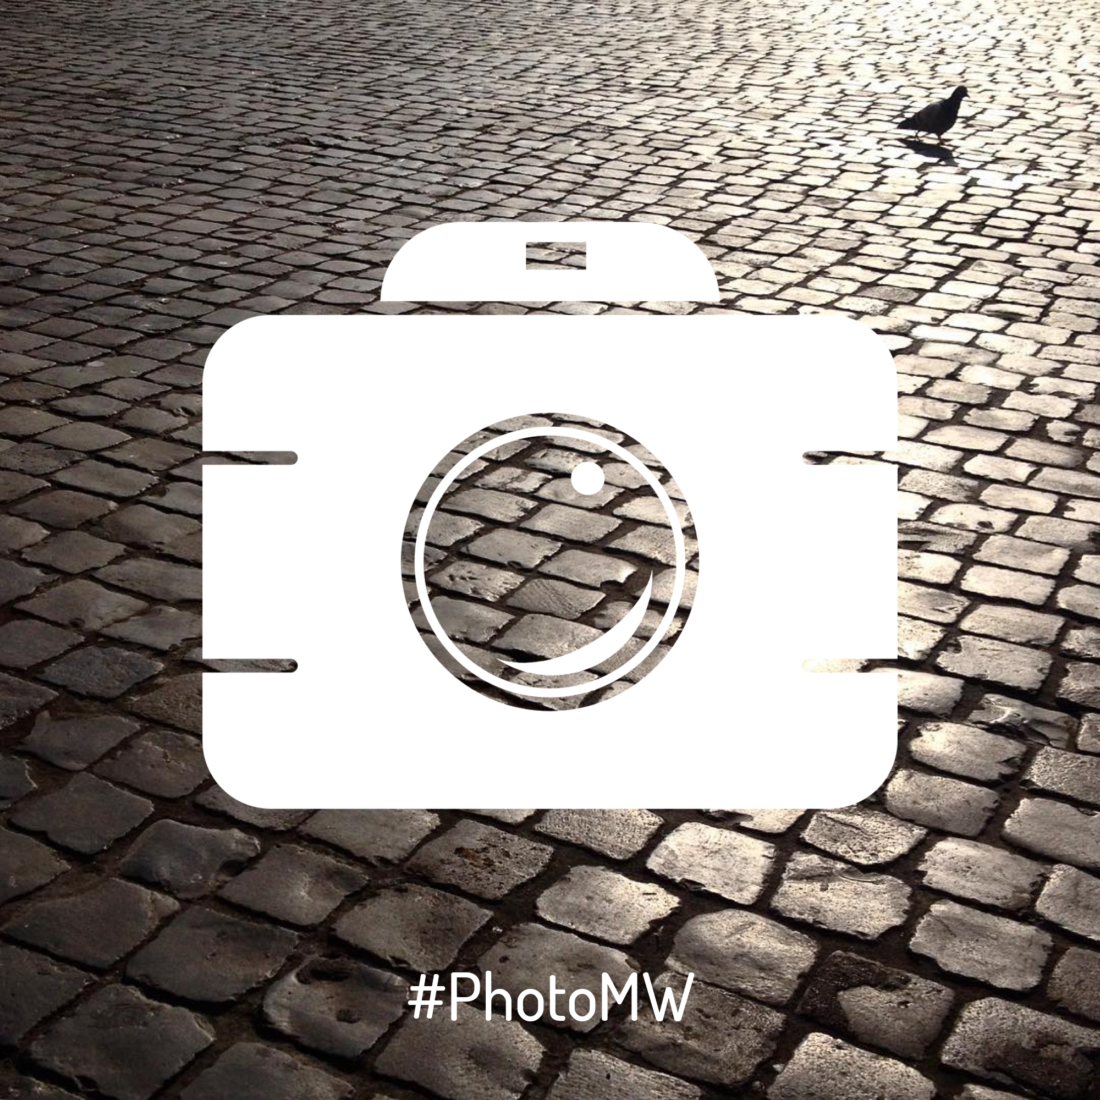 #PhotoMW